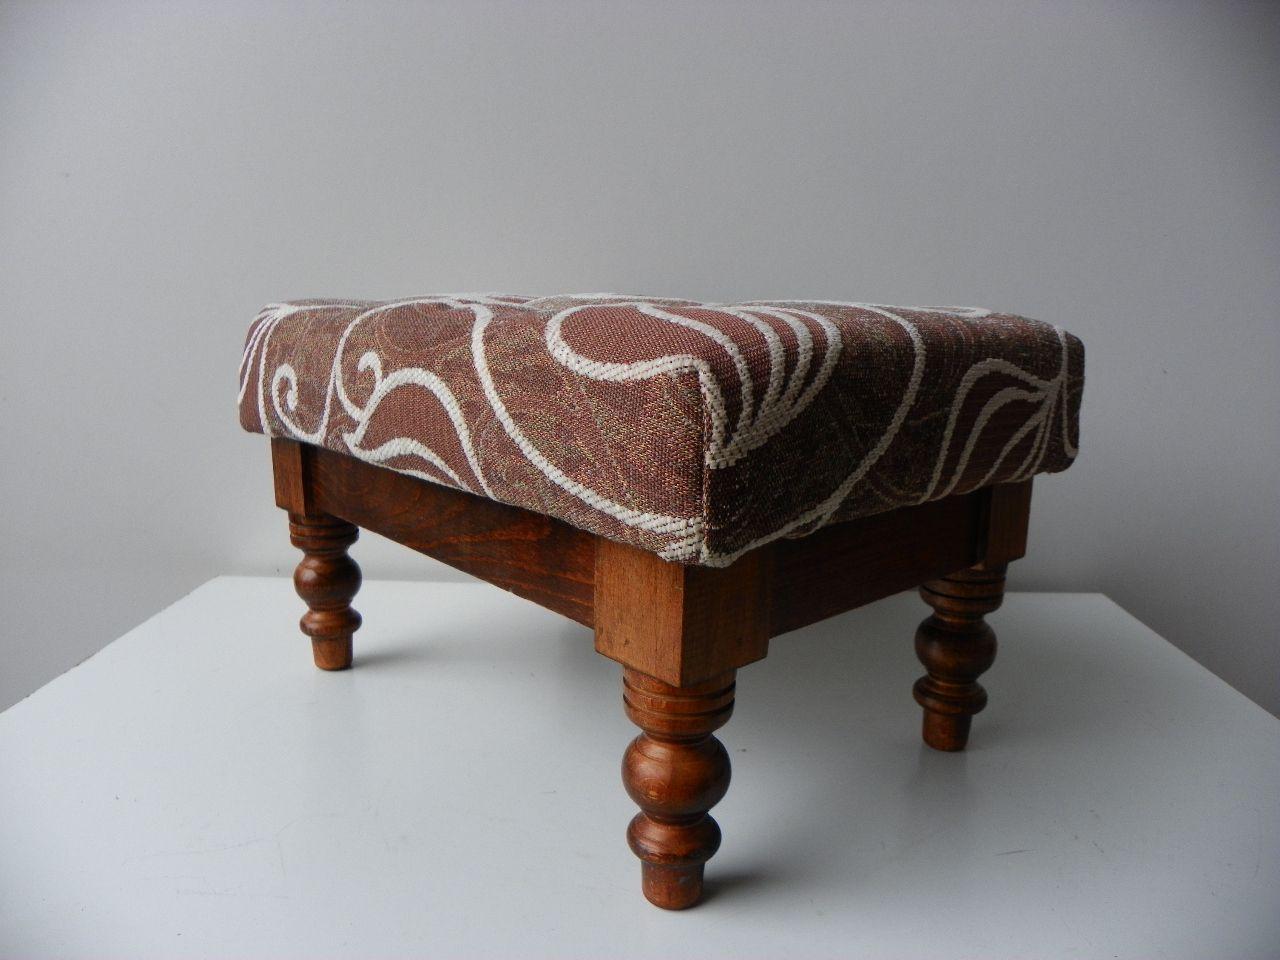 repose pieds vintage 1950s en vente sur pamono. Black Bedroom Furniture Sets. Home Design Ideas